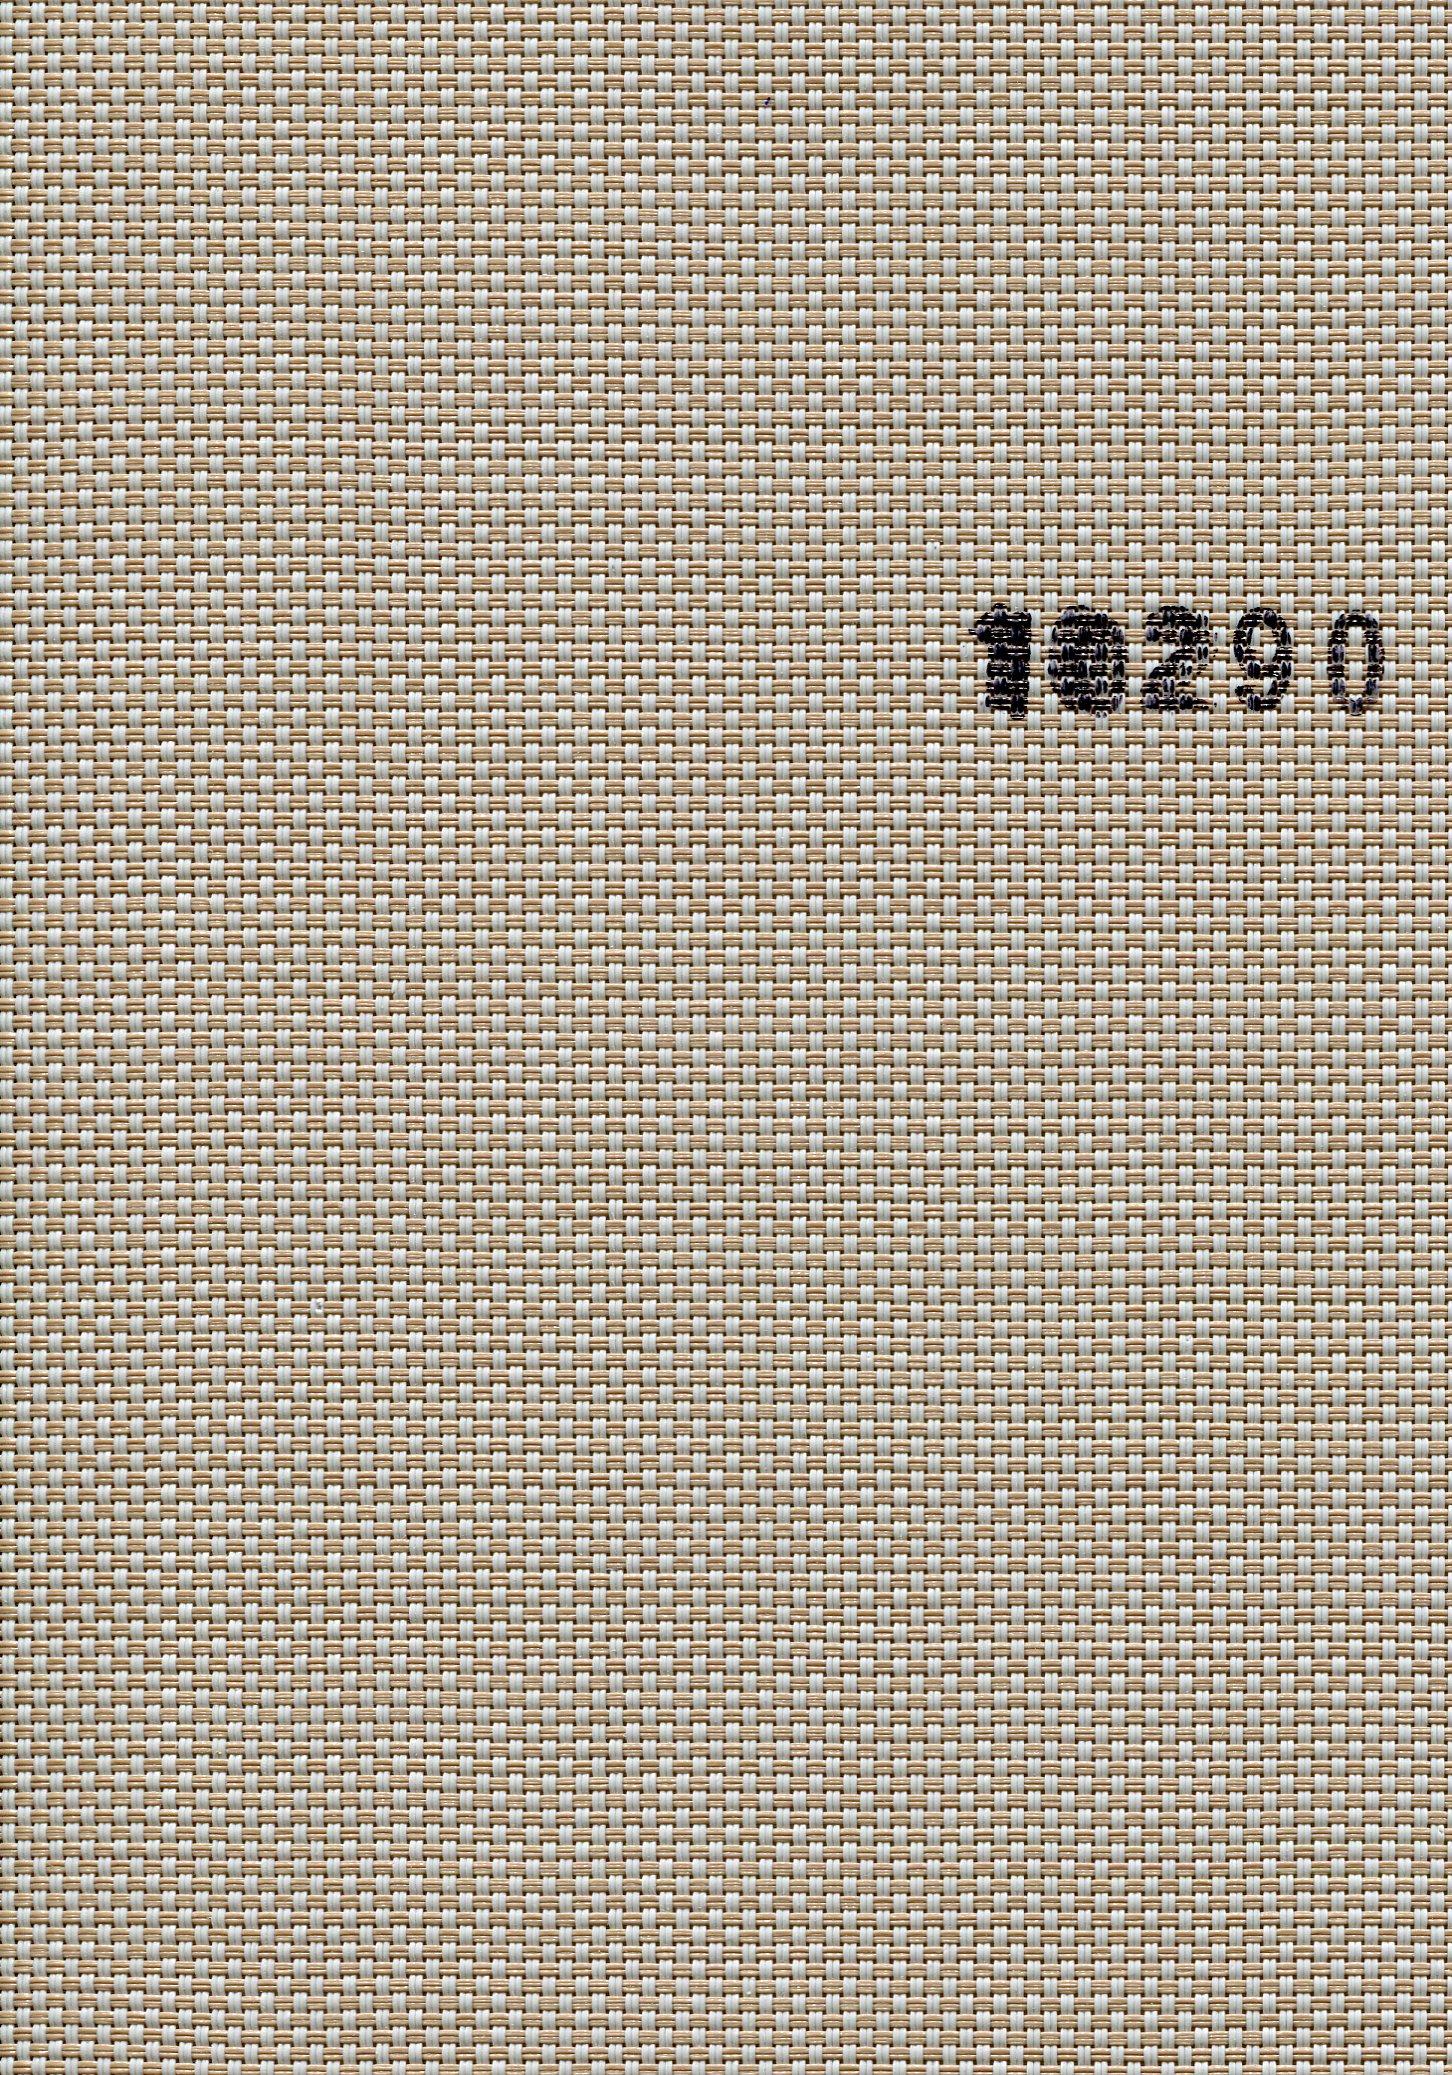 Screen 10290